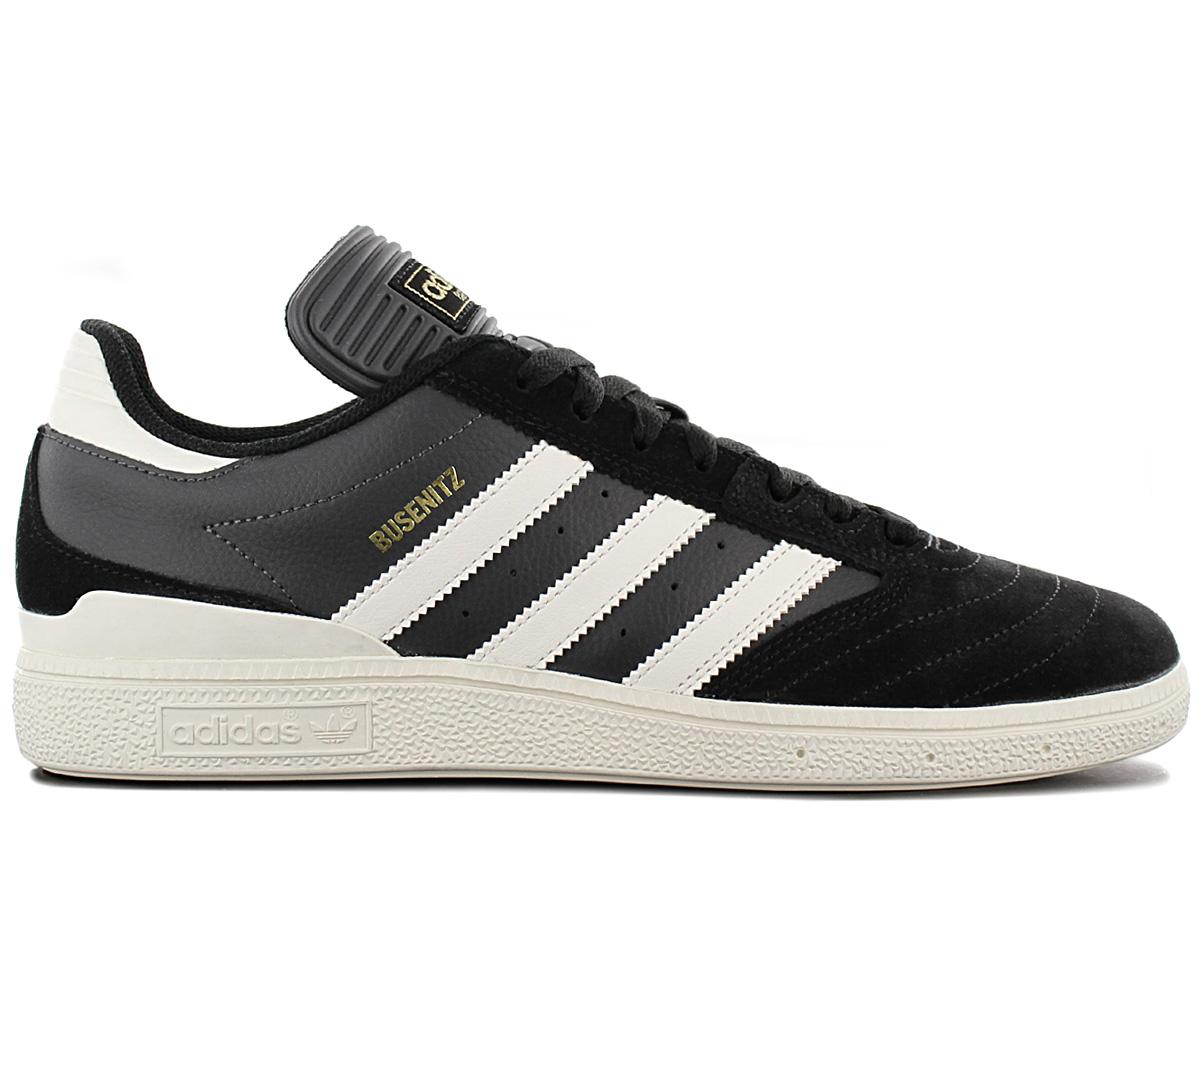 Details about Adidas Originals Busenitz Pro Mens Trainers CQ1156 Skate Shoes Trainers New show original title